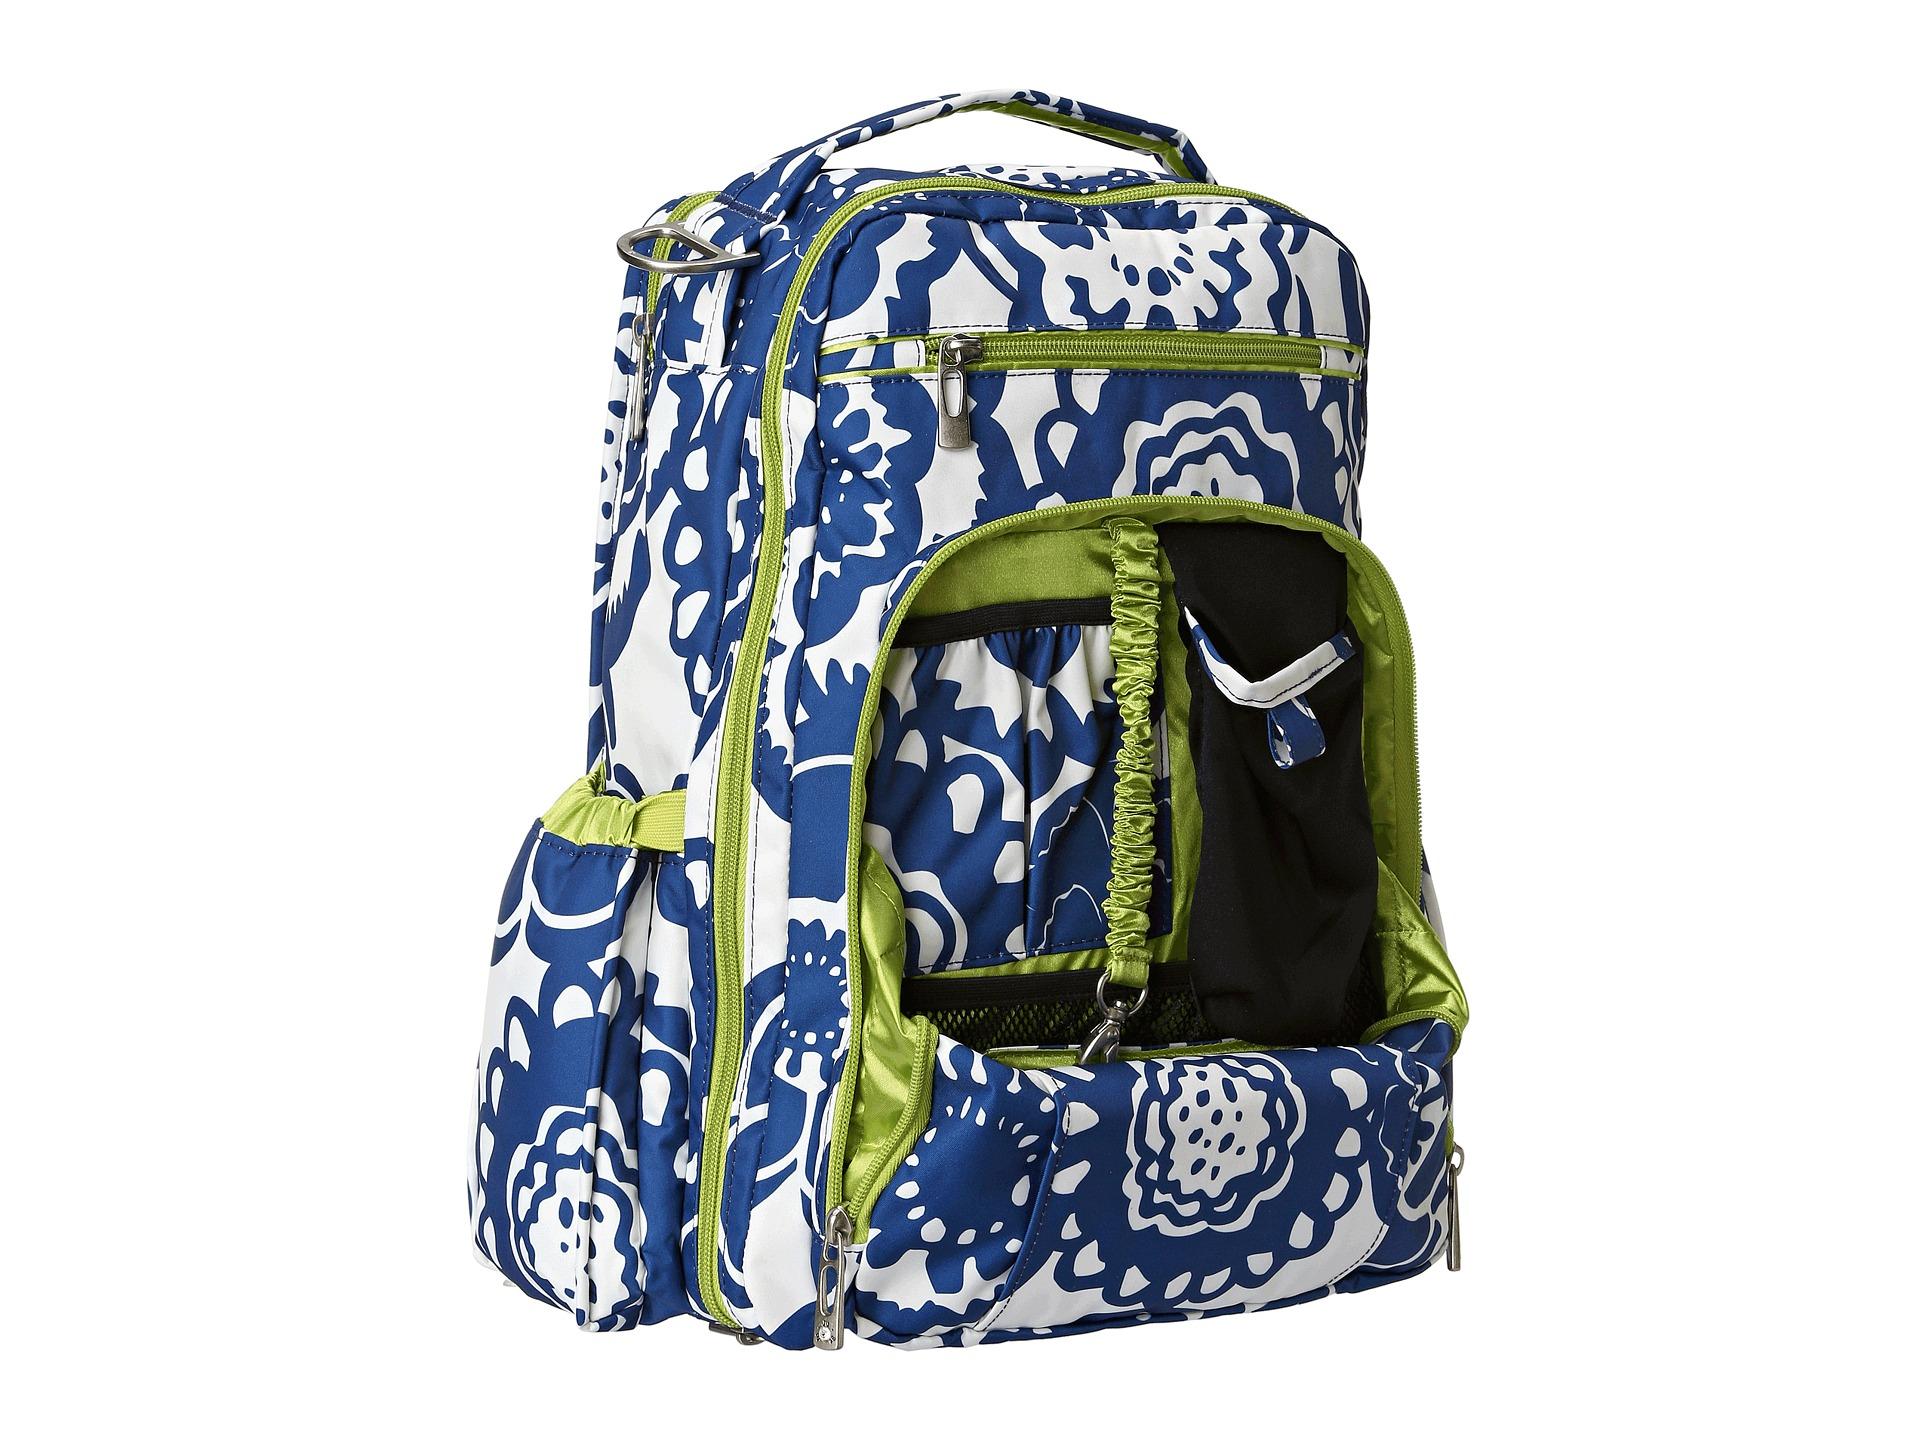 ju ju be be right back backpack diaper bag shipped free. Black Bedroom Furniture Sets. Home Design Ideas